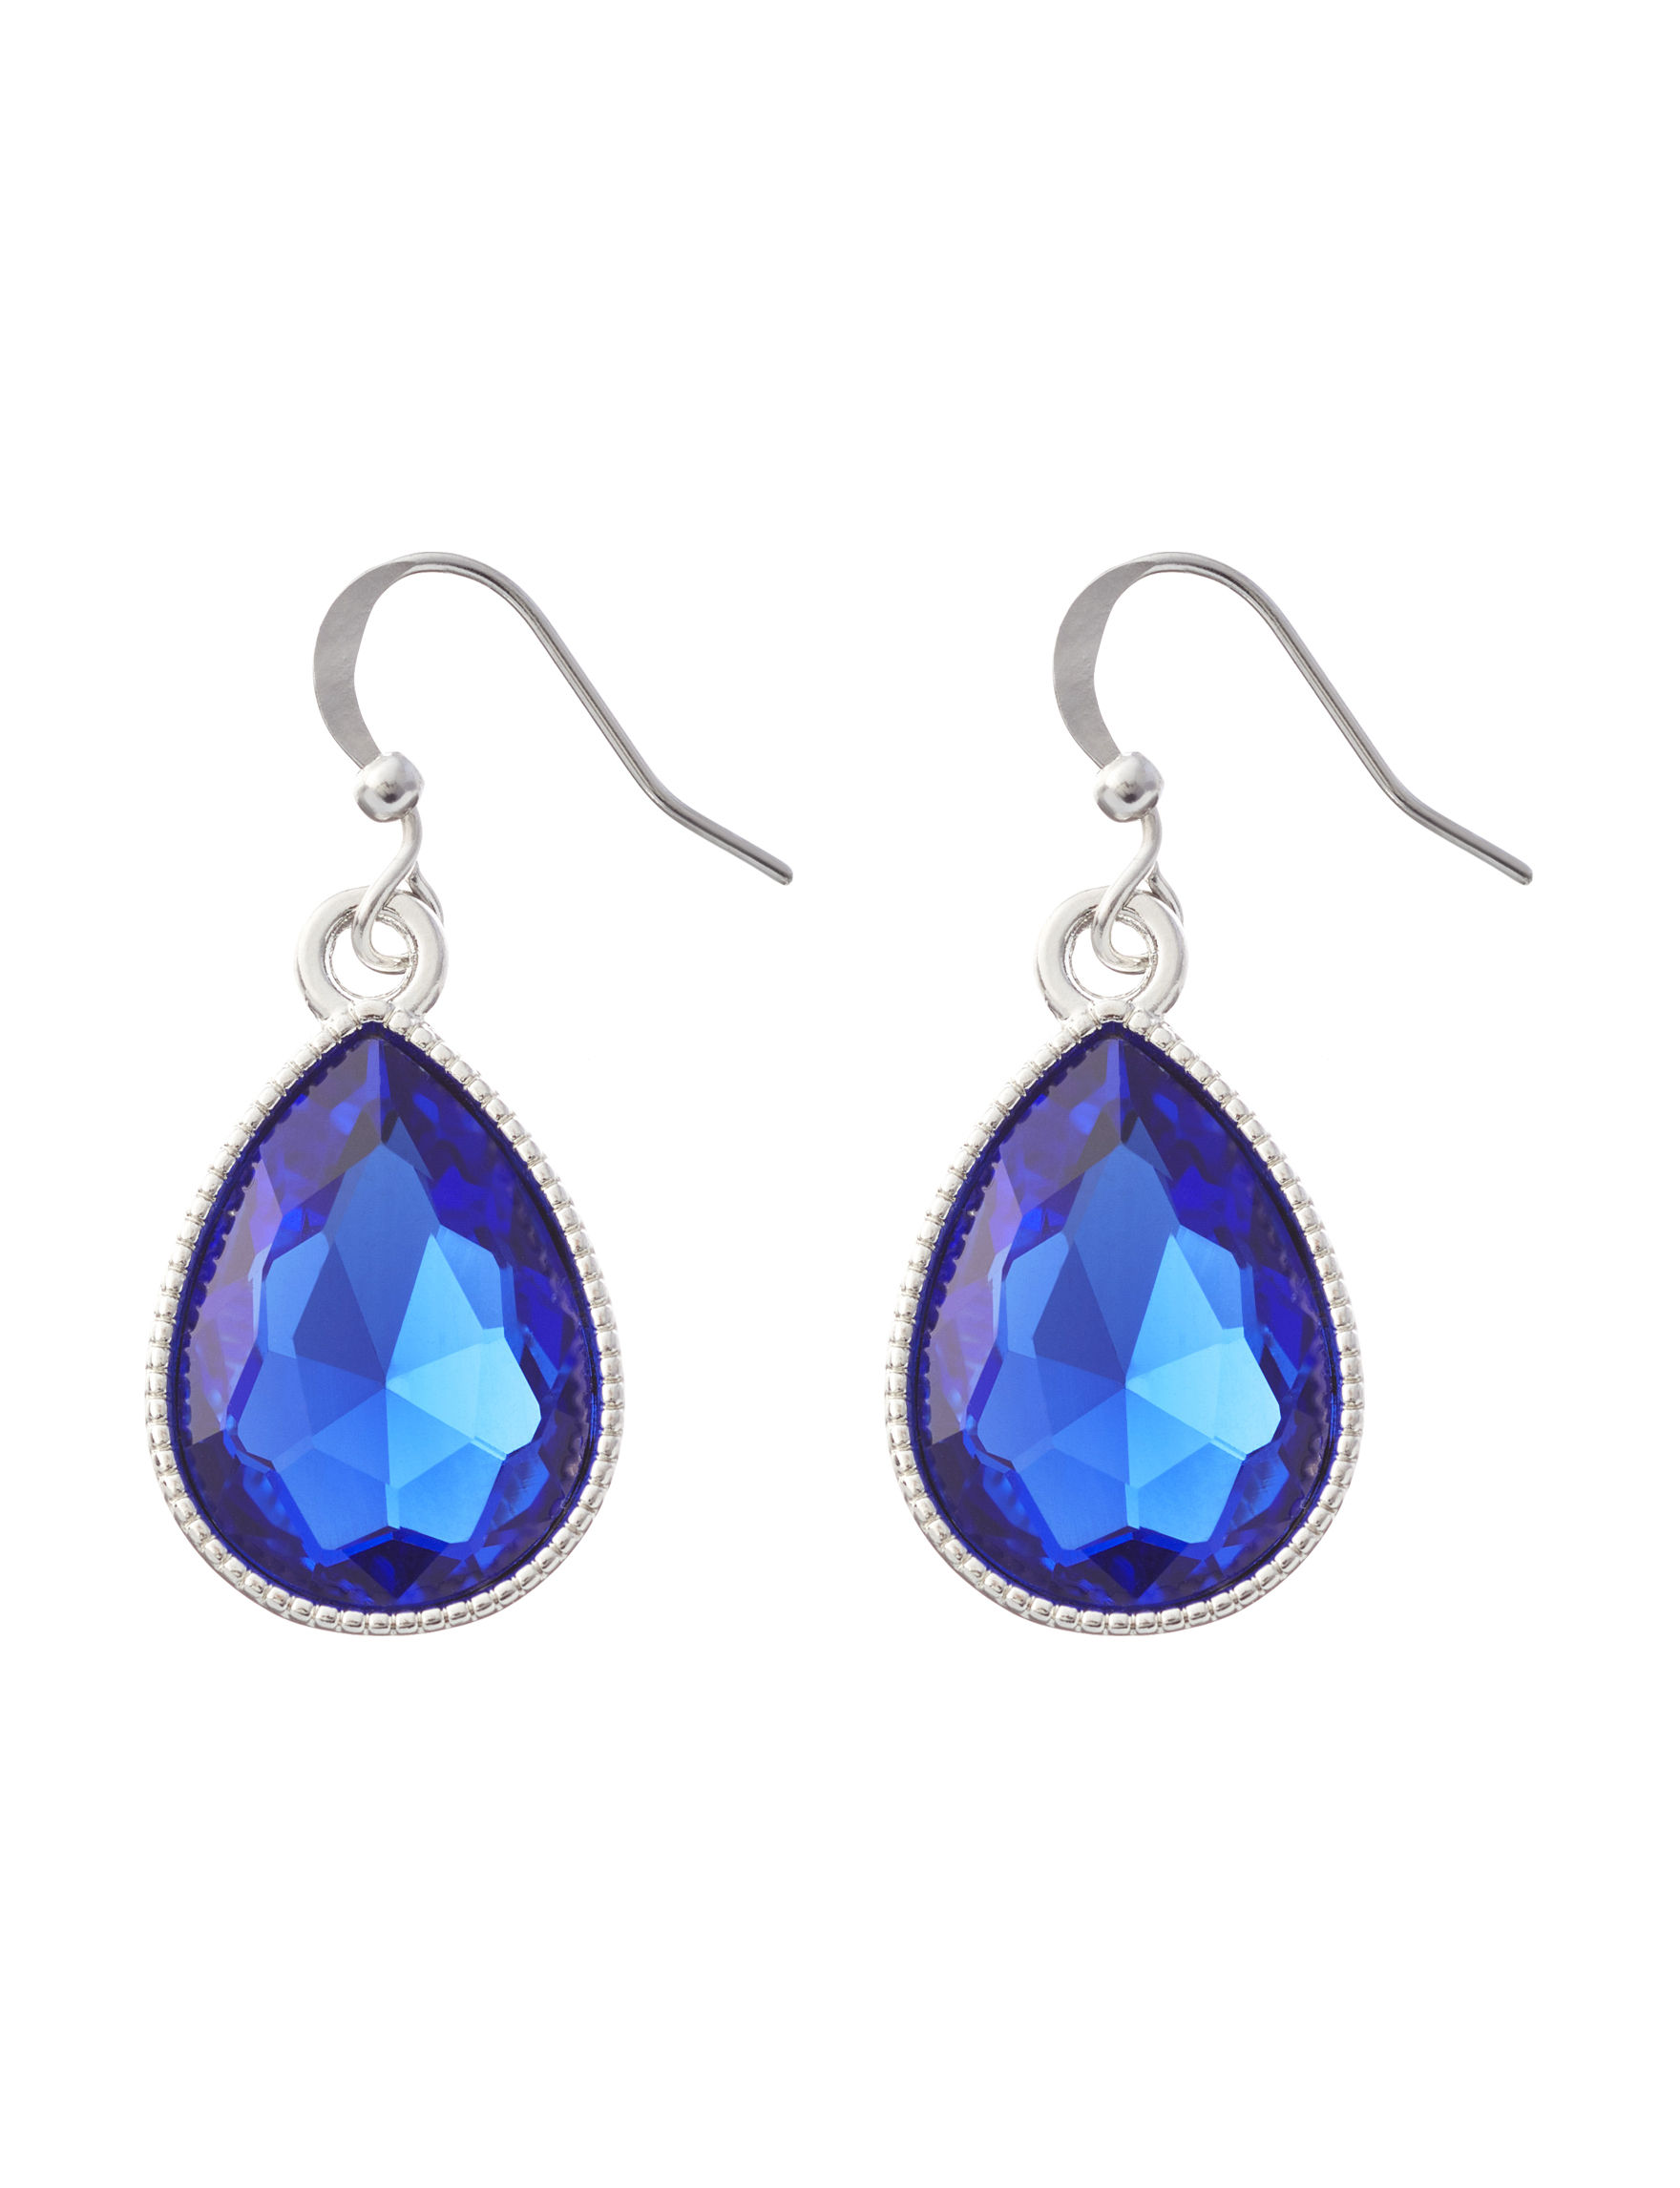 Hannah Blue Stone Drops Earrings Fashion Jewelry